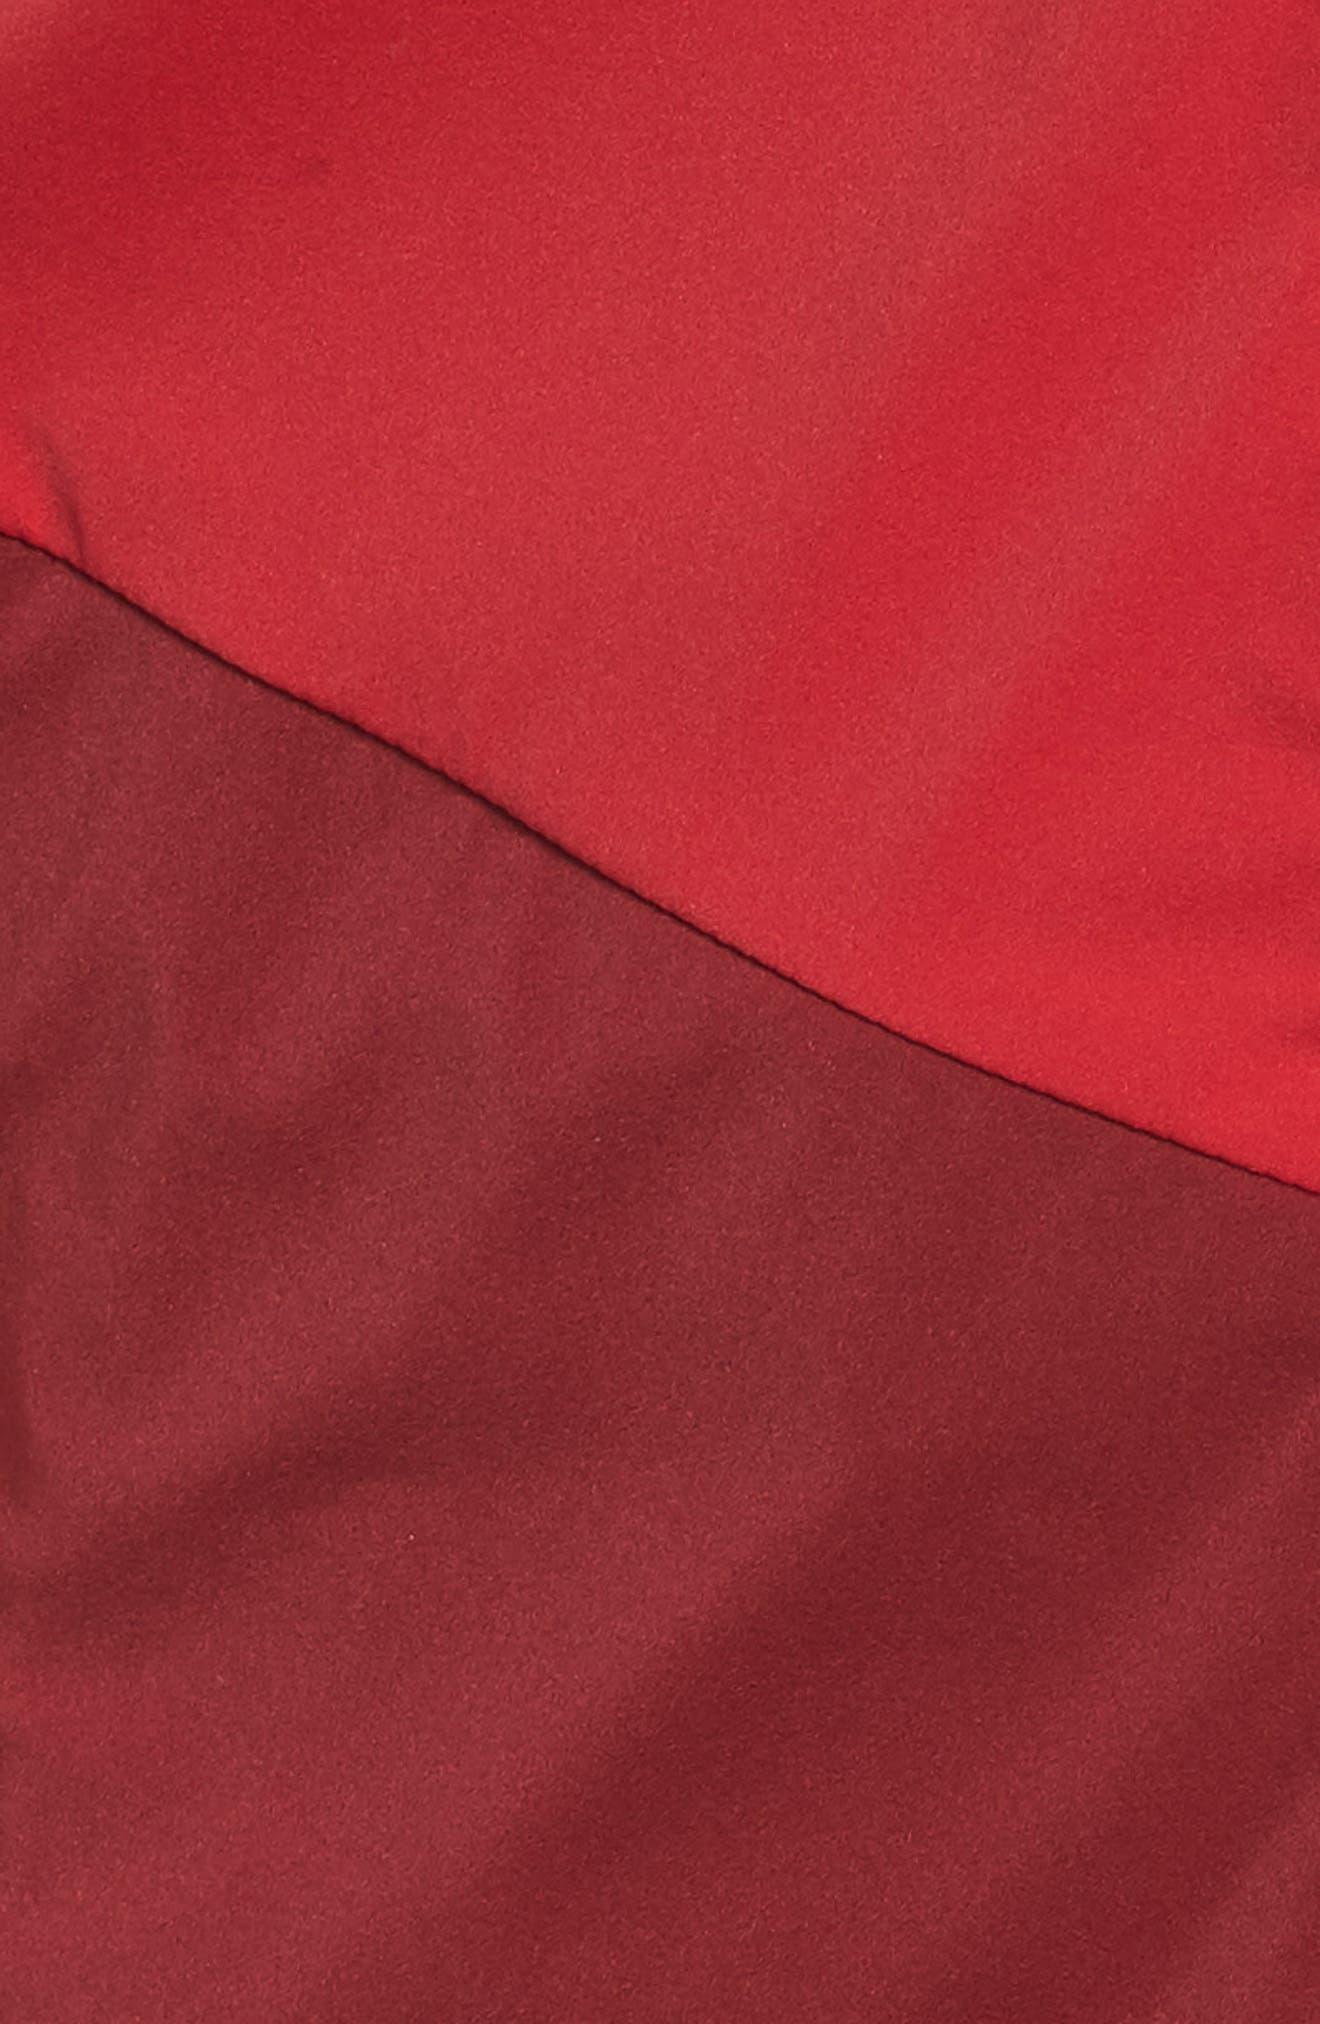 Dry Stadium Jacket,                             Alternate thumbnail 6, color,                             Habanero Red/ Coral